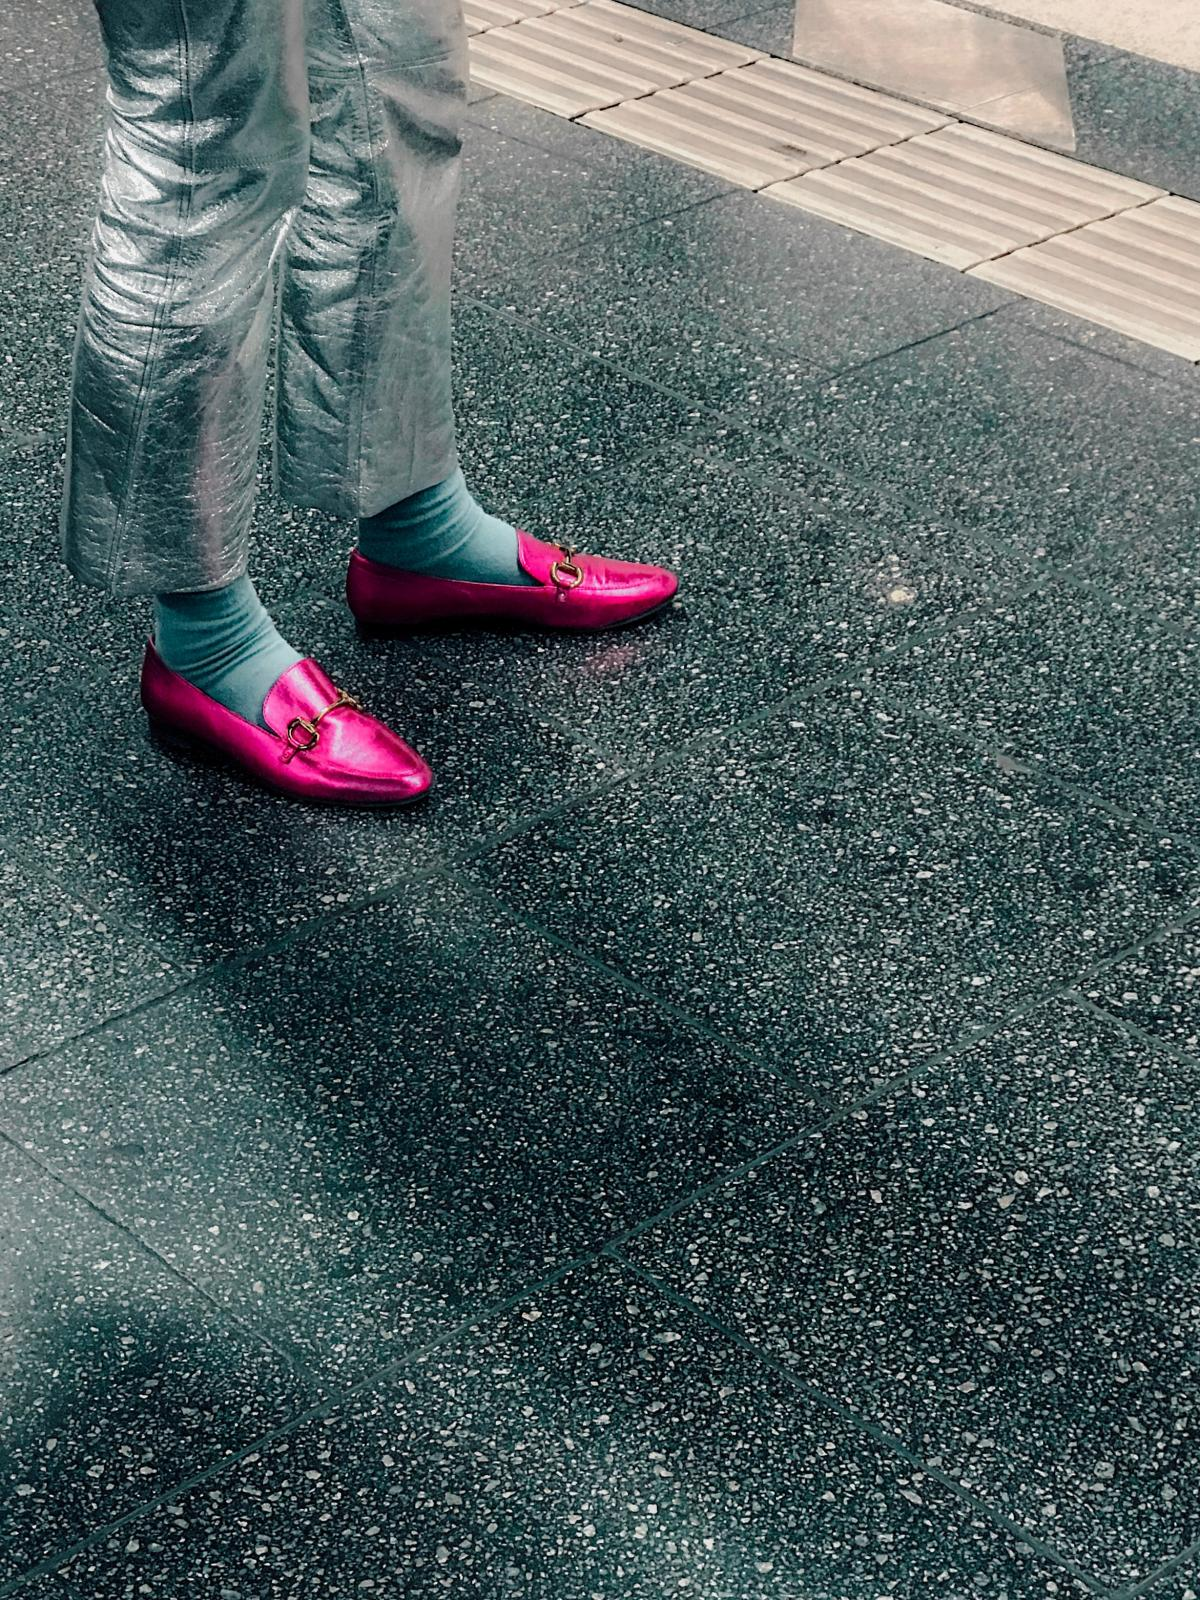 Arctic Shoe Footwear